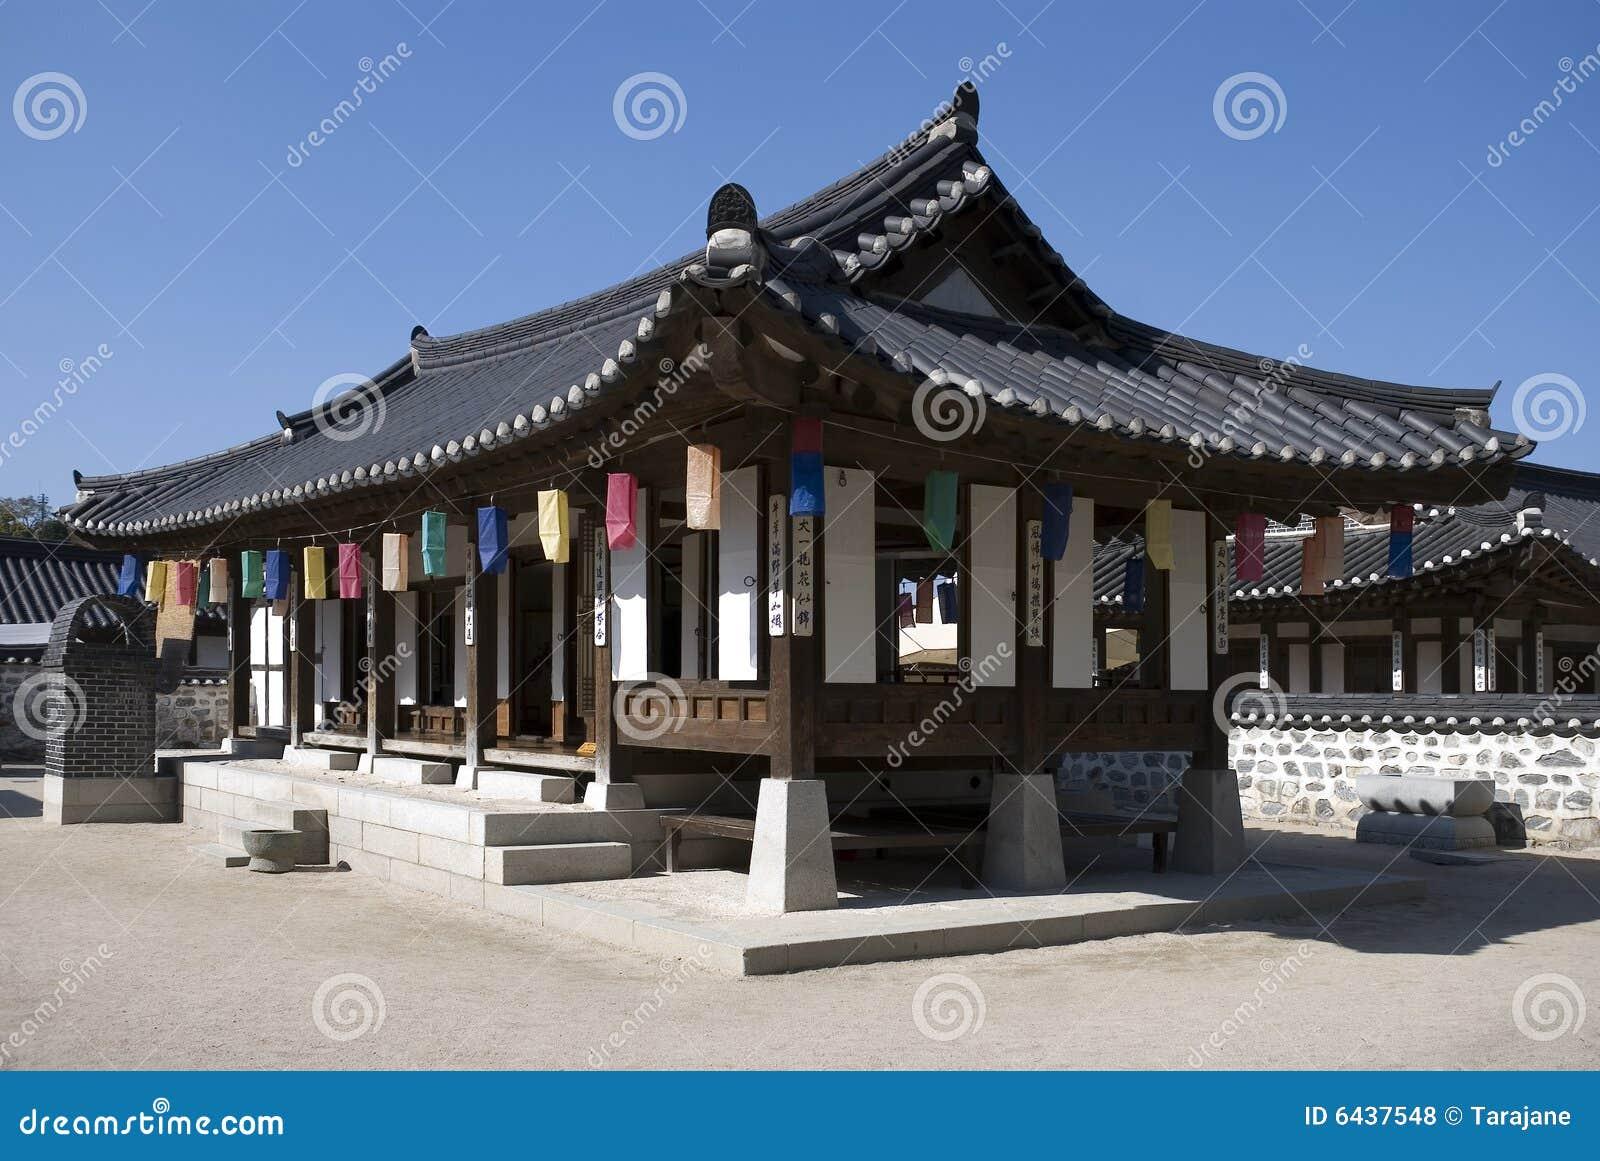 ^ ncient Korean House oyalty Free Stock Photos - Image: 6437548